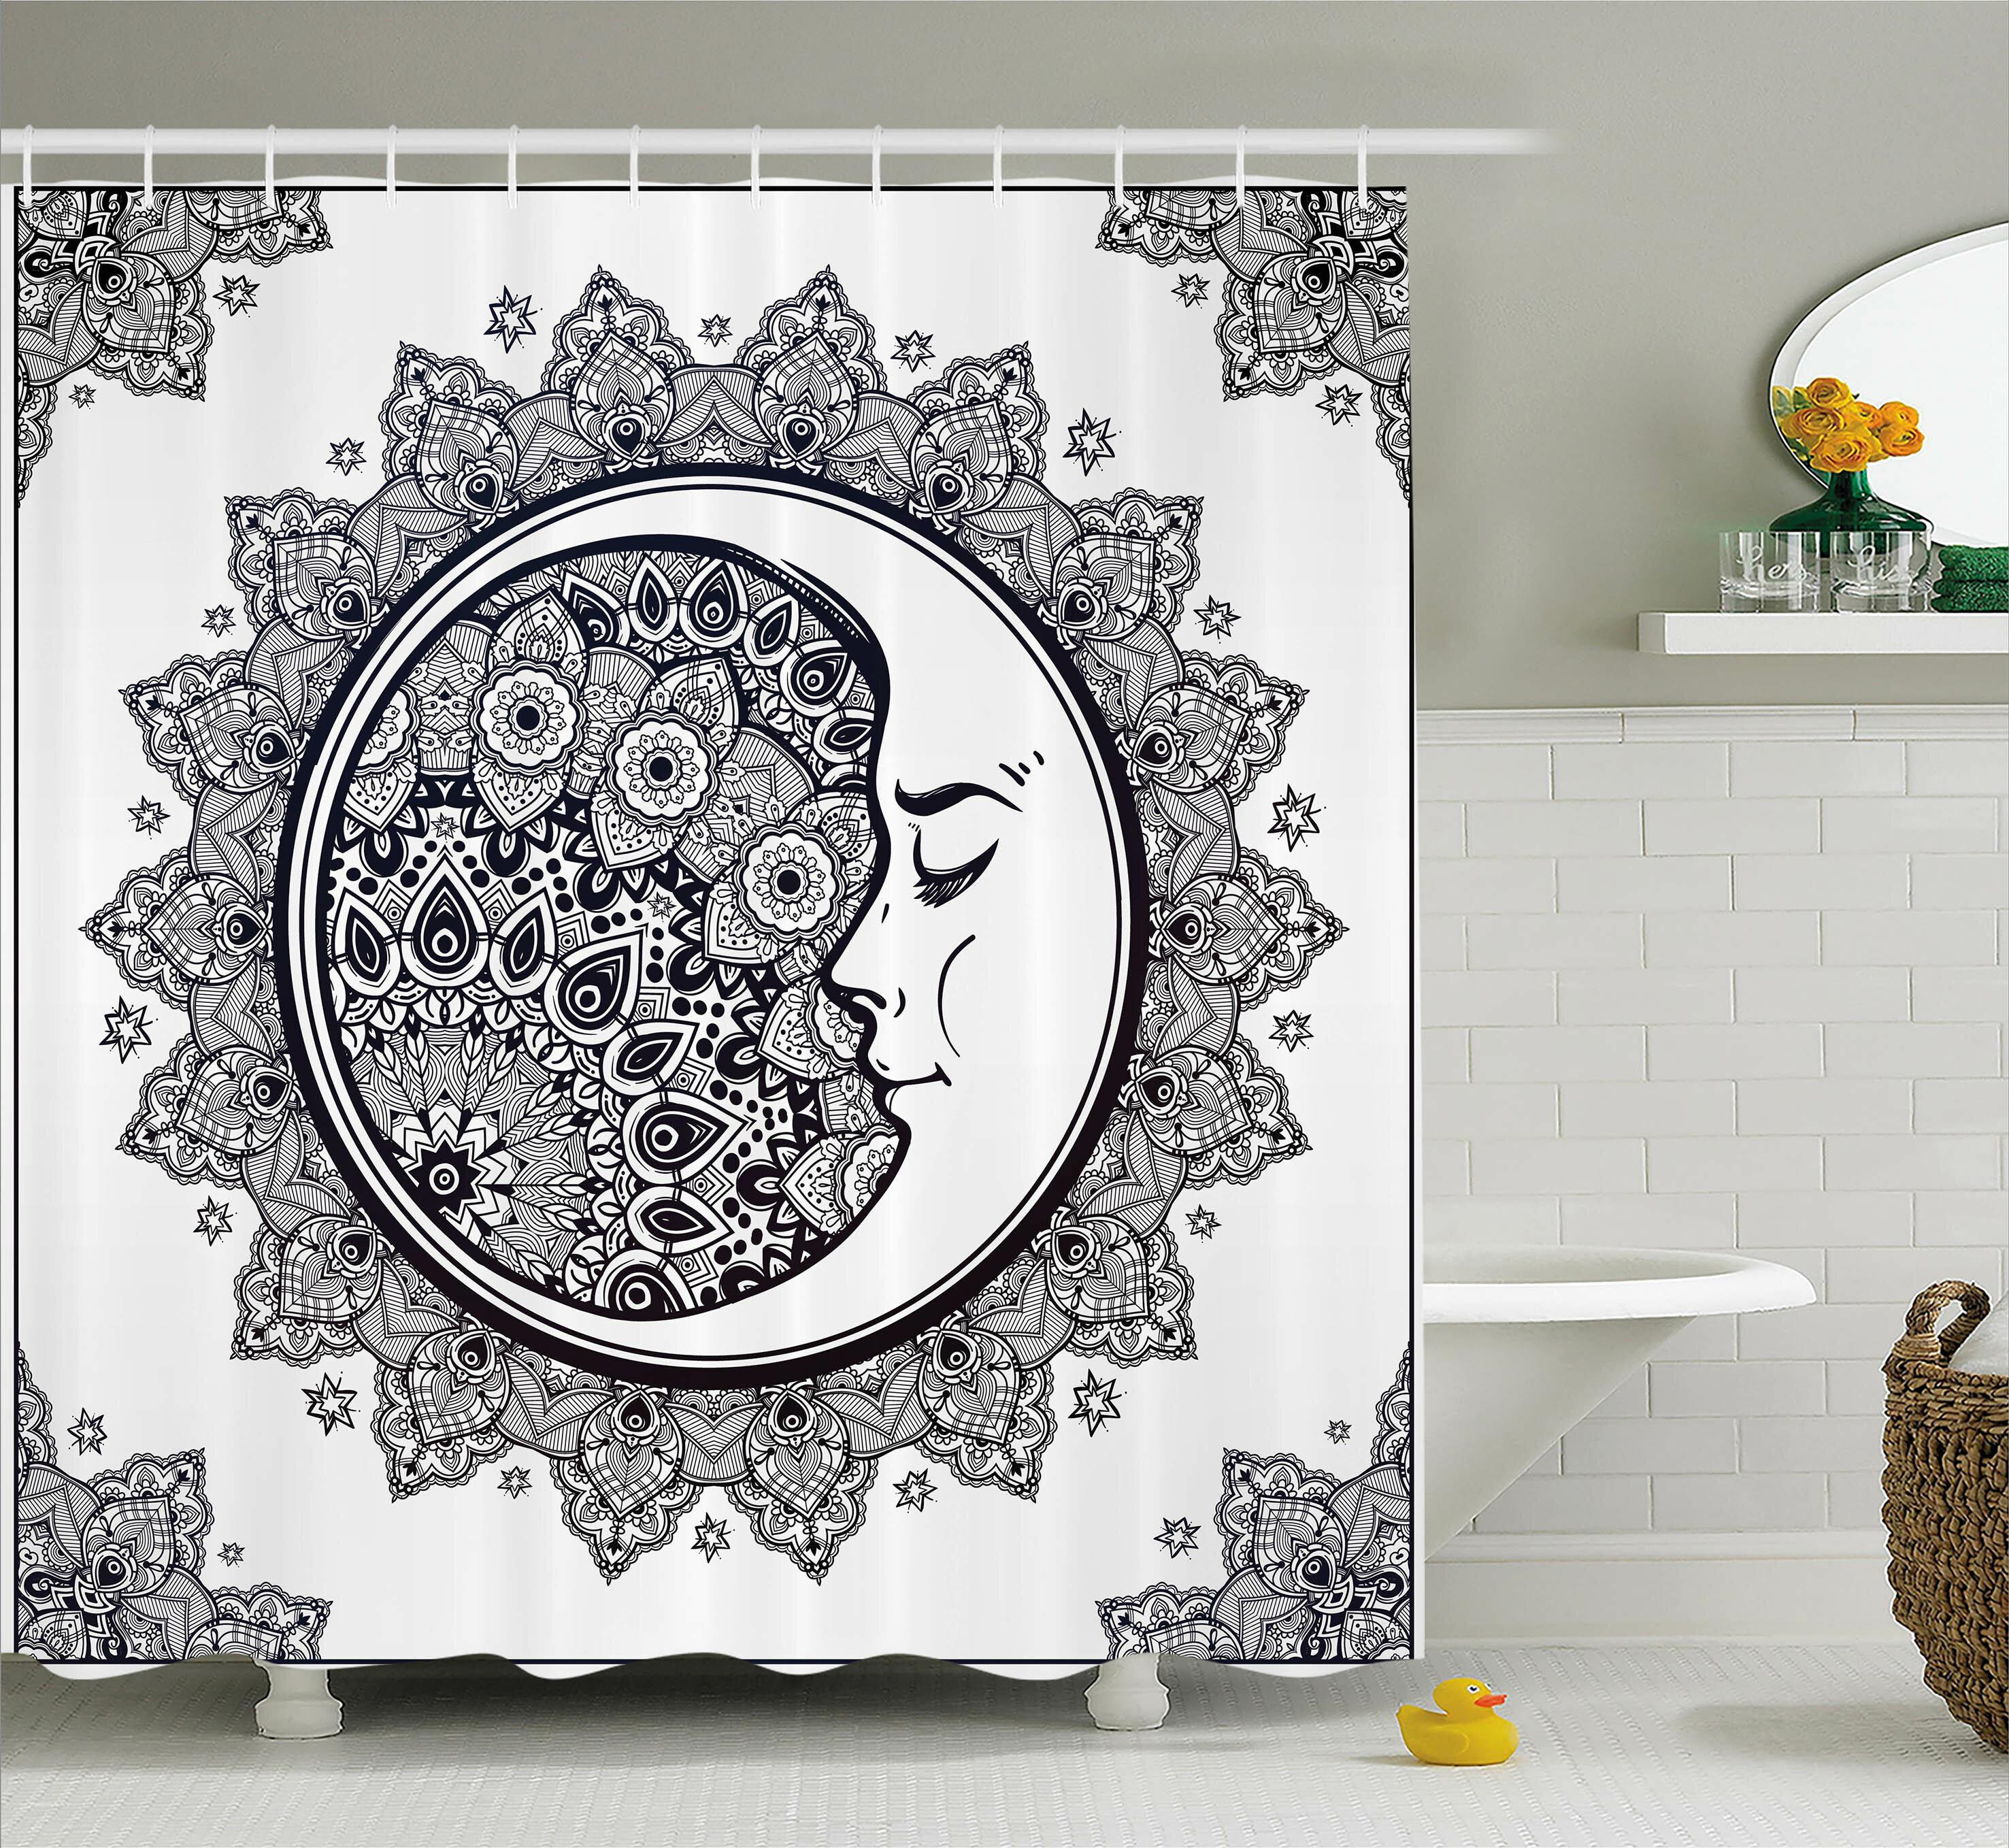 East Urban Home Zodiac Boho Star Moon Mandala Shower Curtain